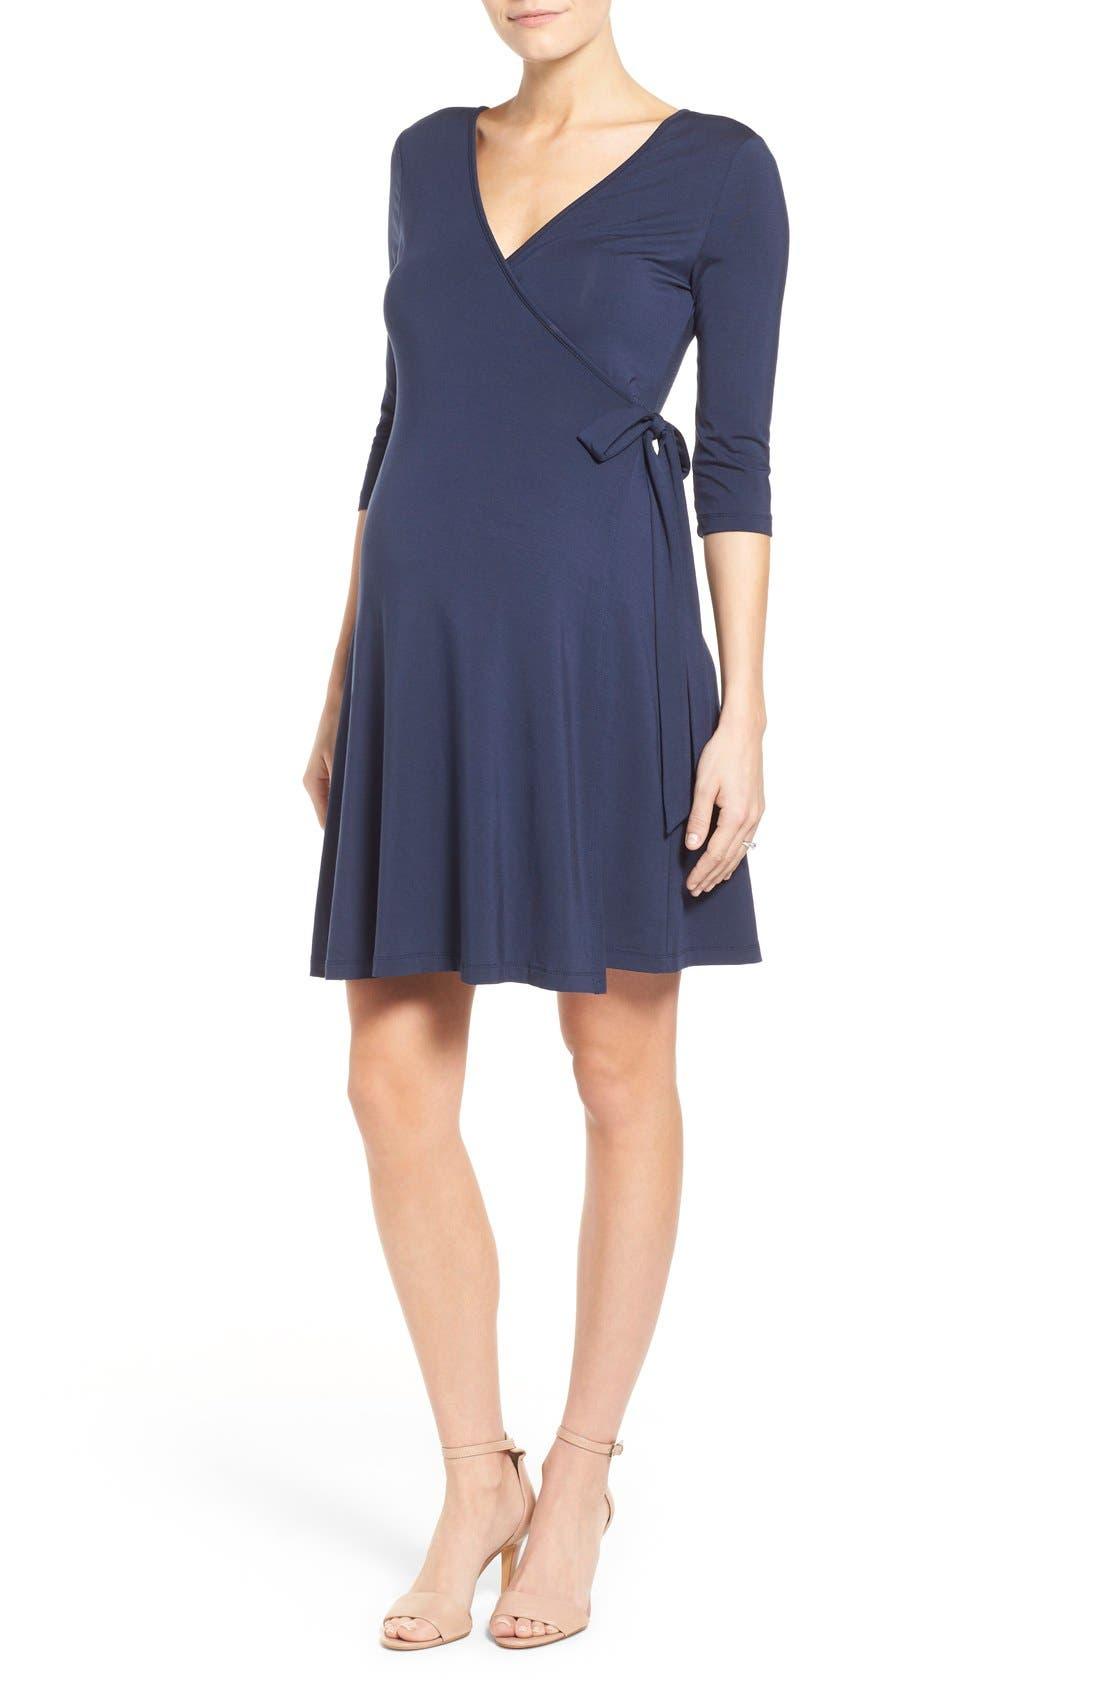 'Rhiannon' Turtleneck Fit & Flare Maternity Dress,                             Main thumbnail 1, color,                             Peacoat